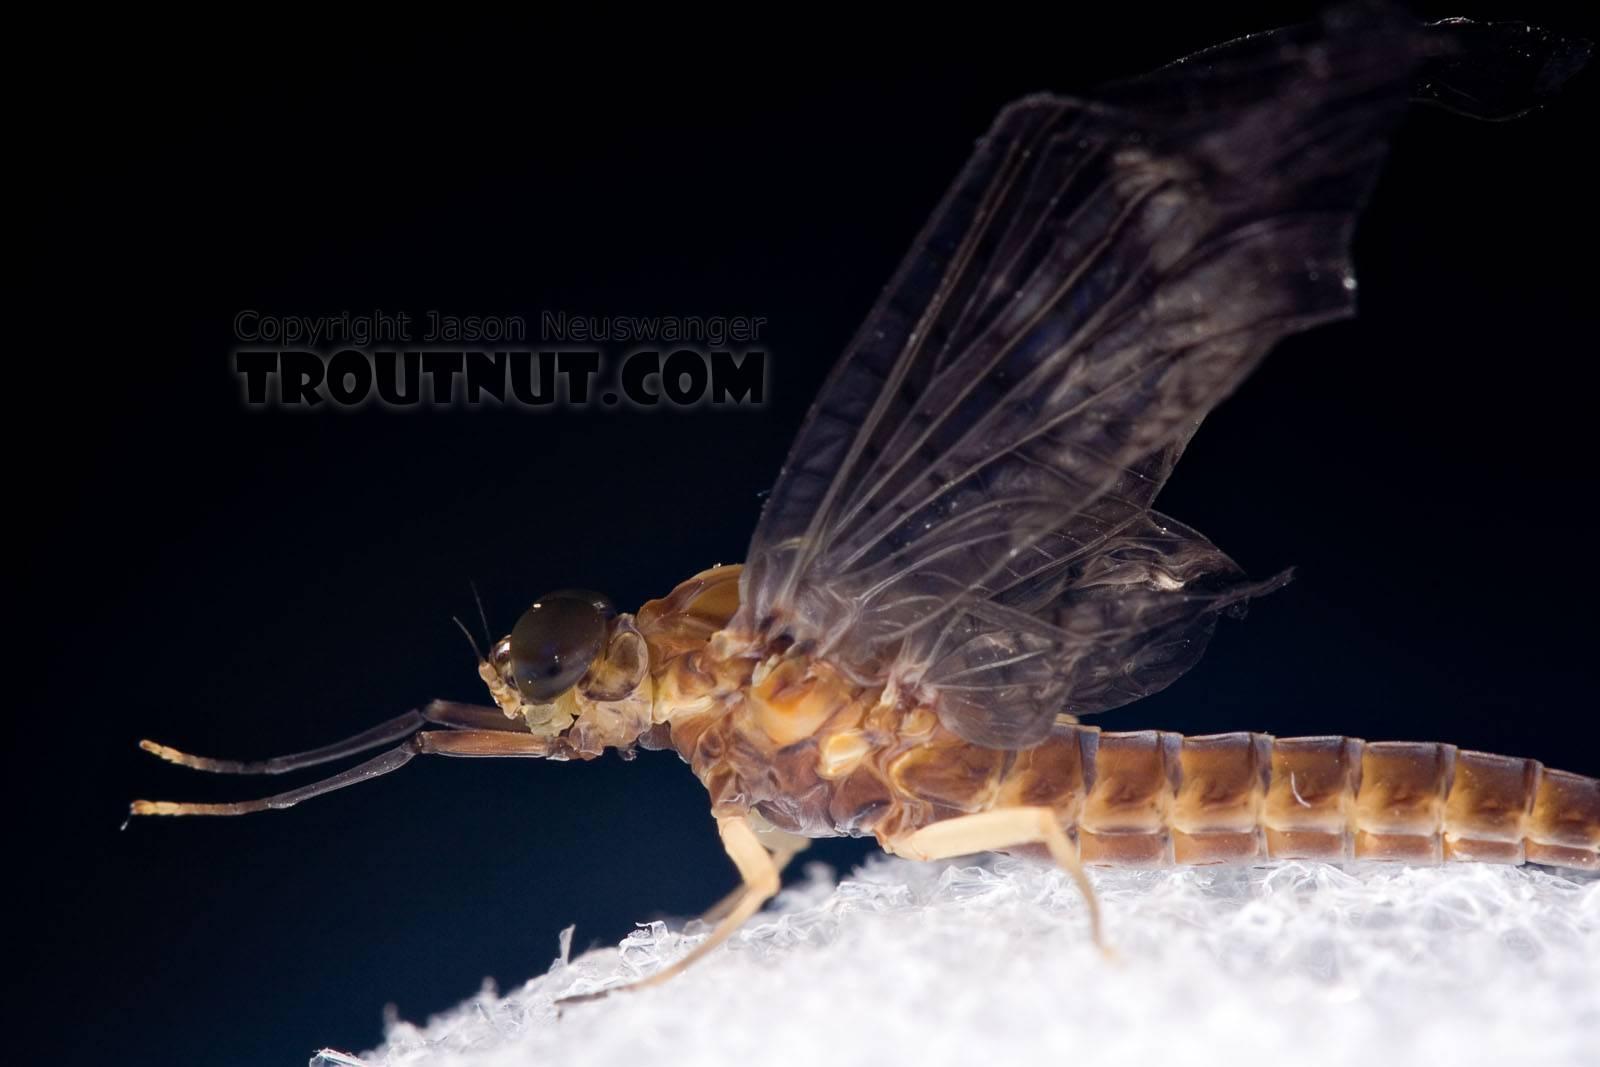 Female Isonychia bicolor (Mahogany Dun) Mayfly Dun from Penn's Creek in Pennsylvania